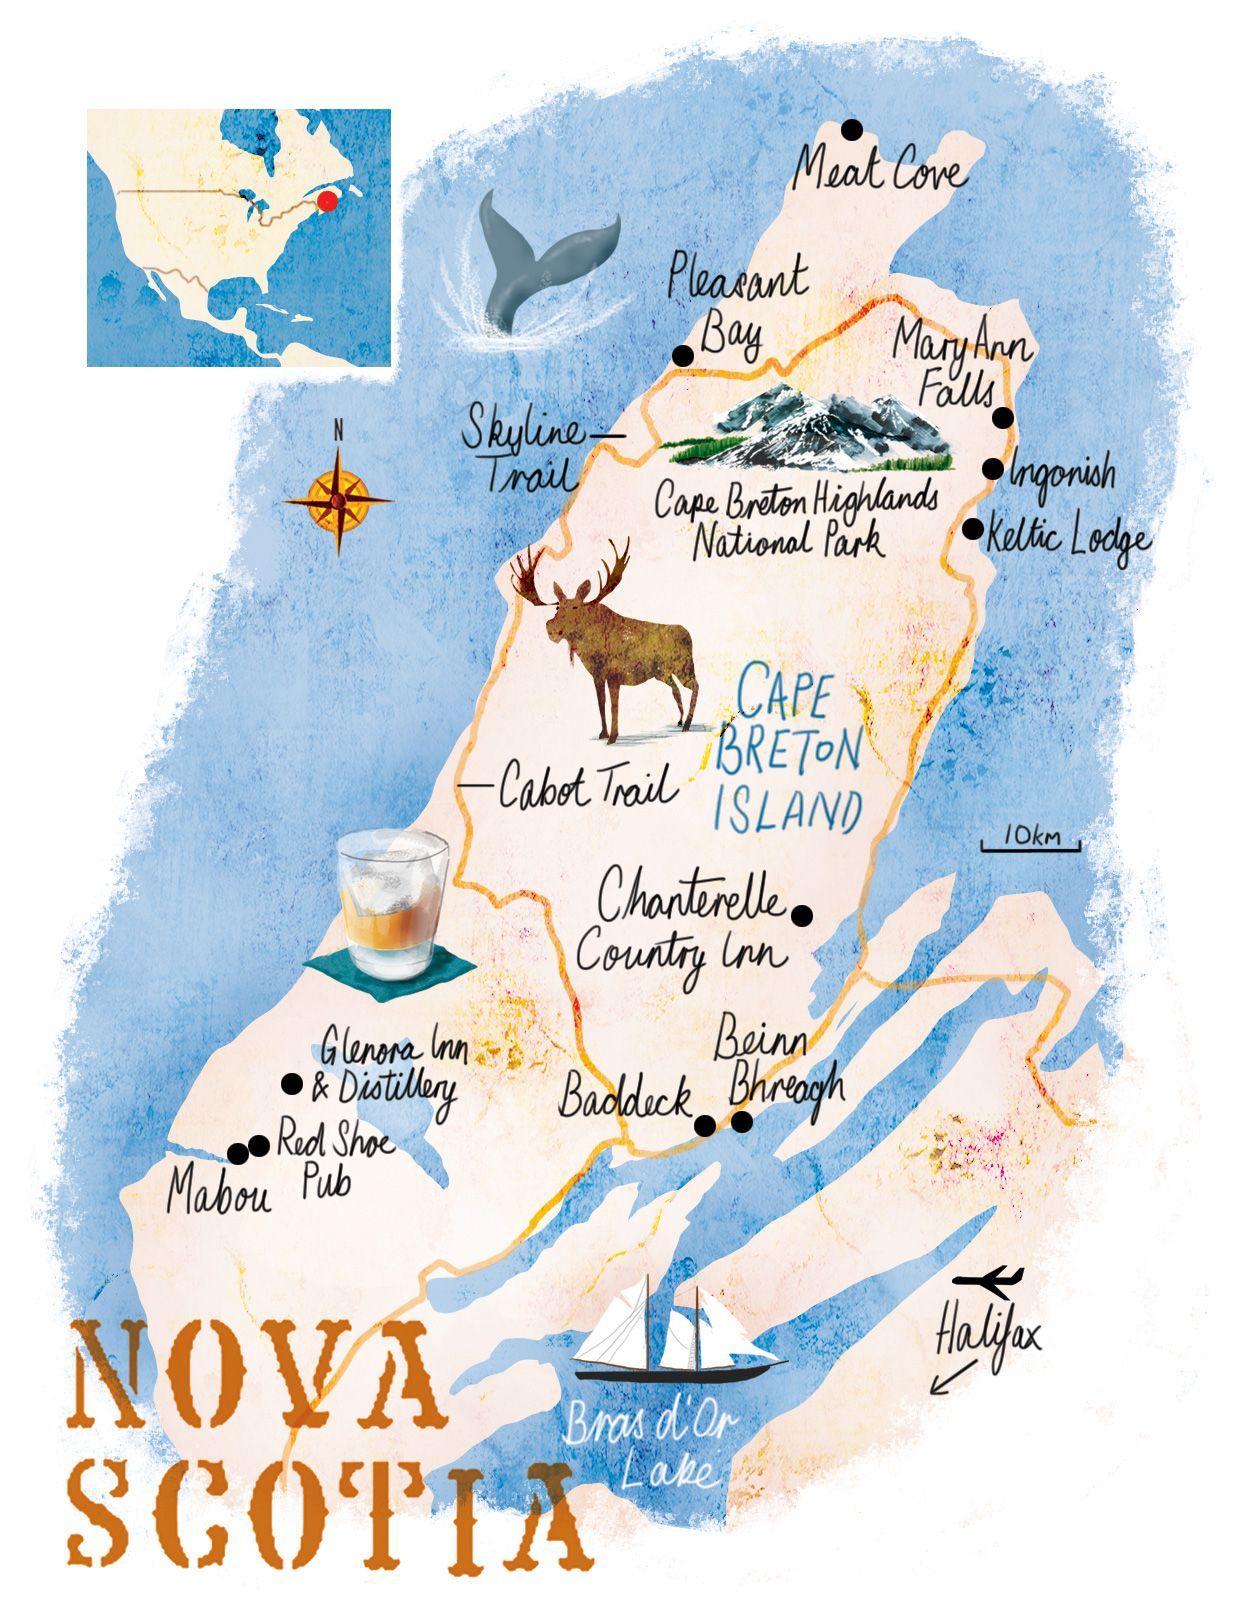 nova scotia map scott jessop nova scotia in 2018 pinterest